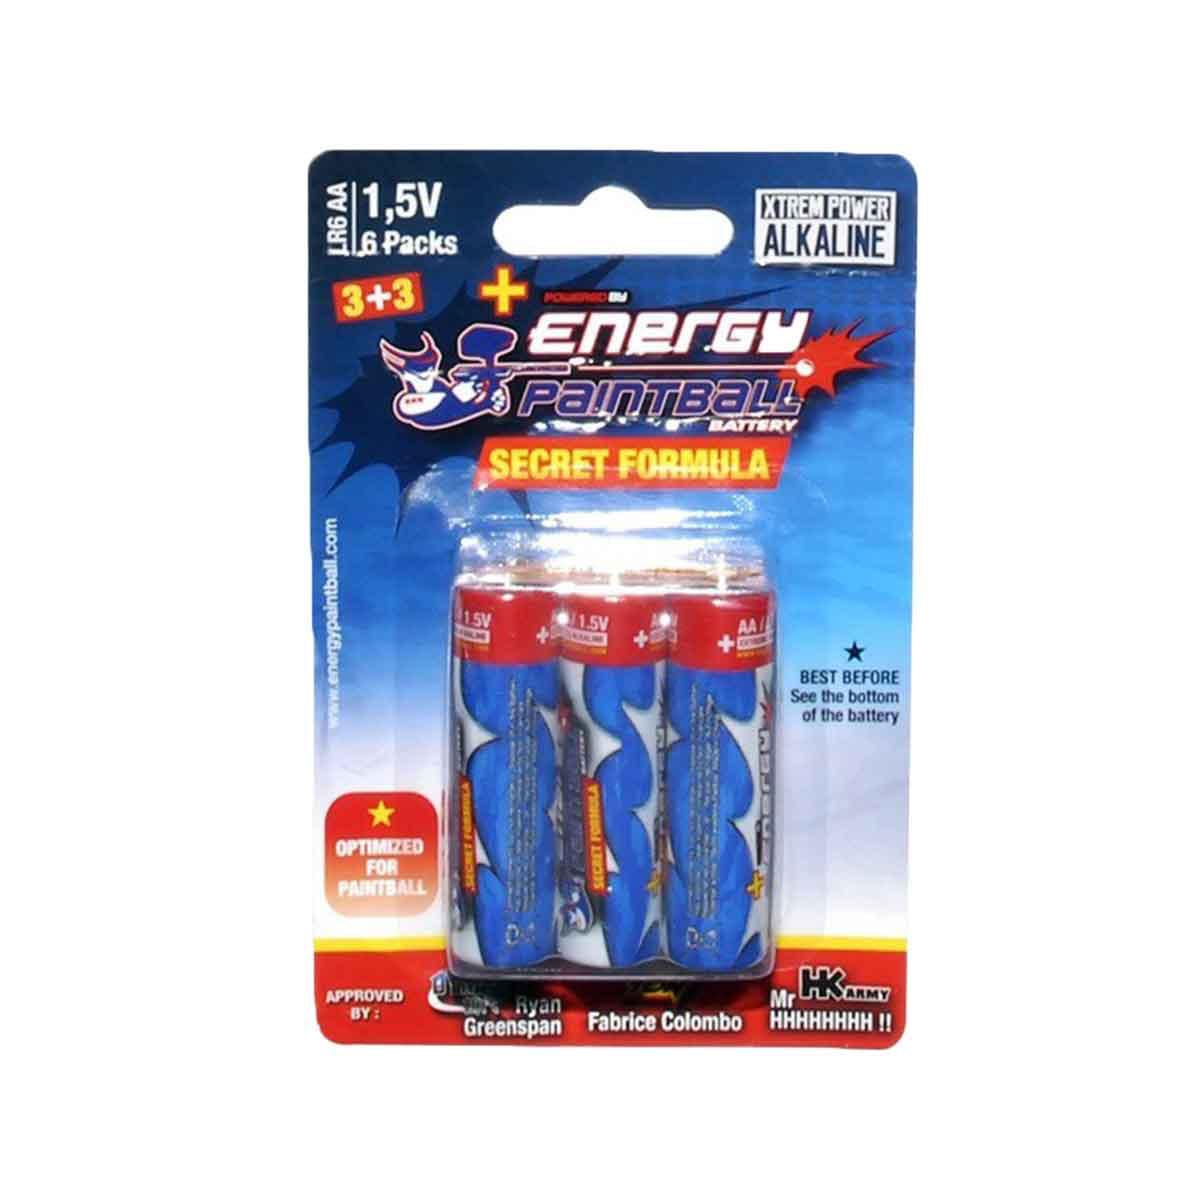 Energy Paintball Batteries Secret Formula AA 6 Pack by Energy Paintball